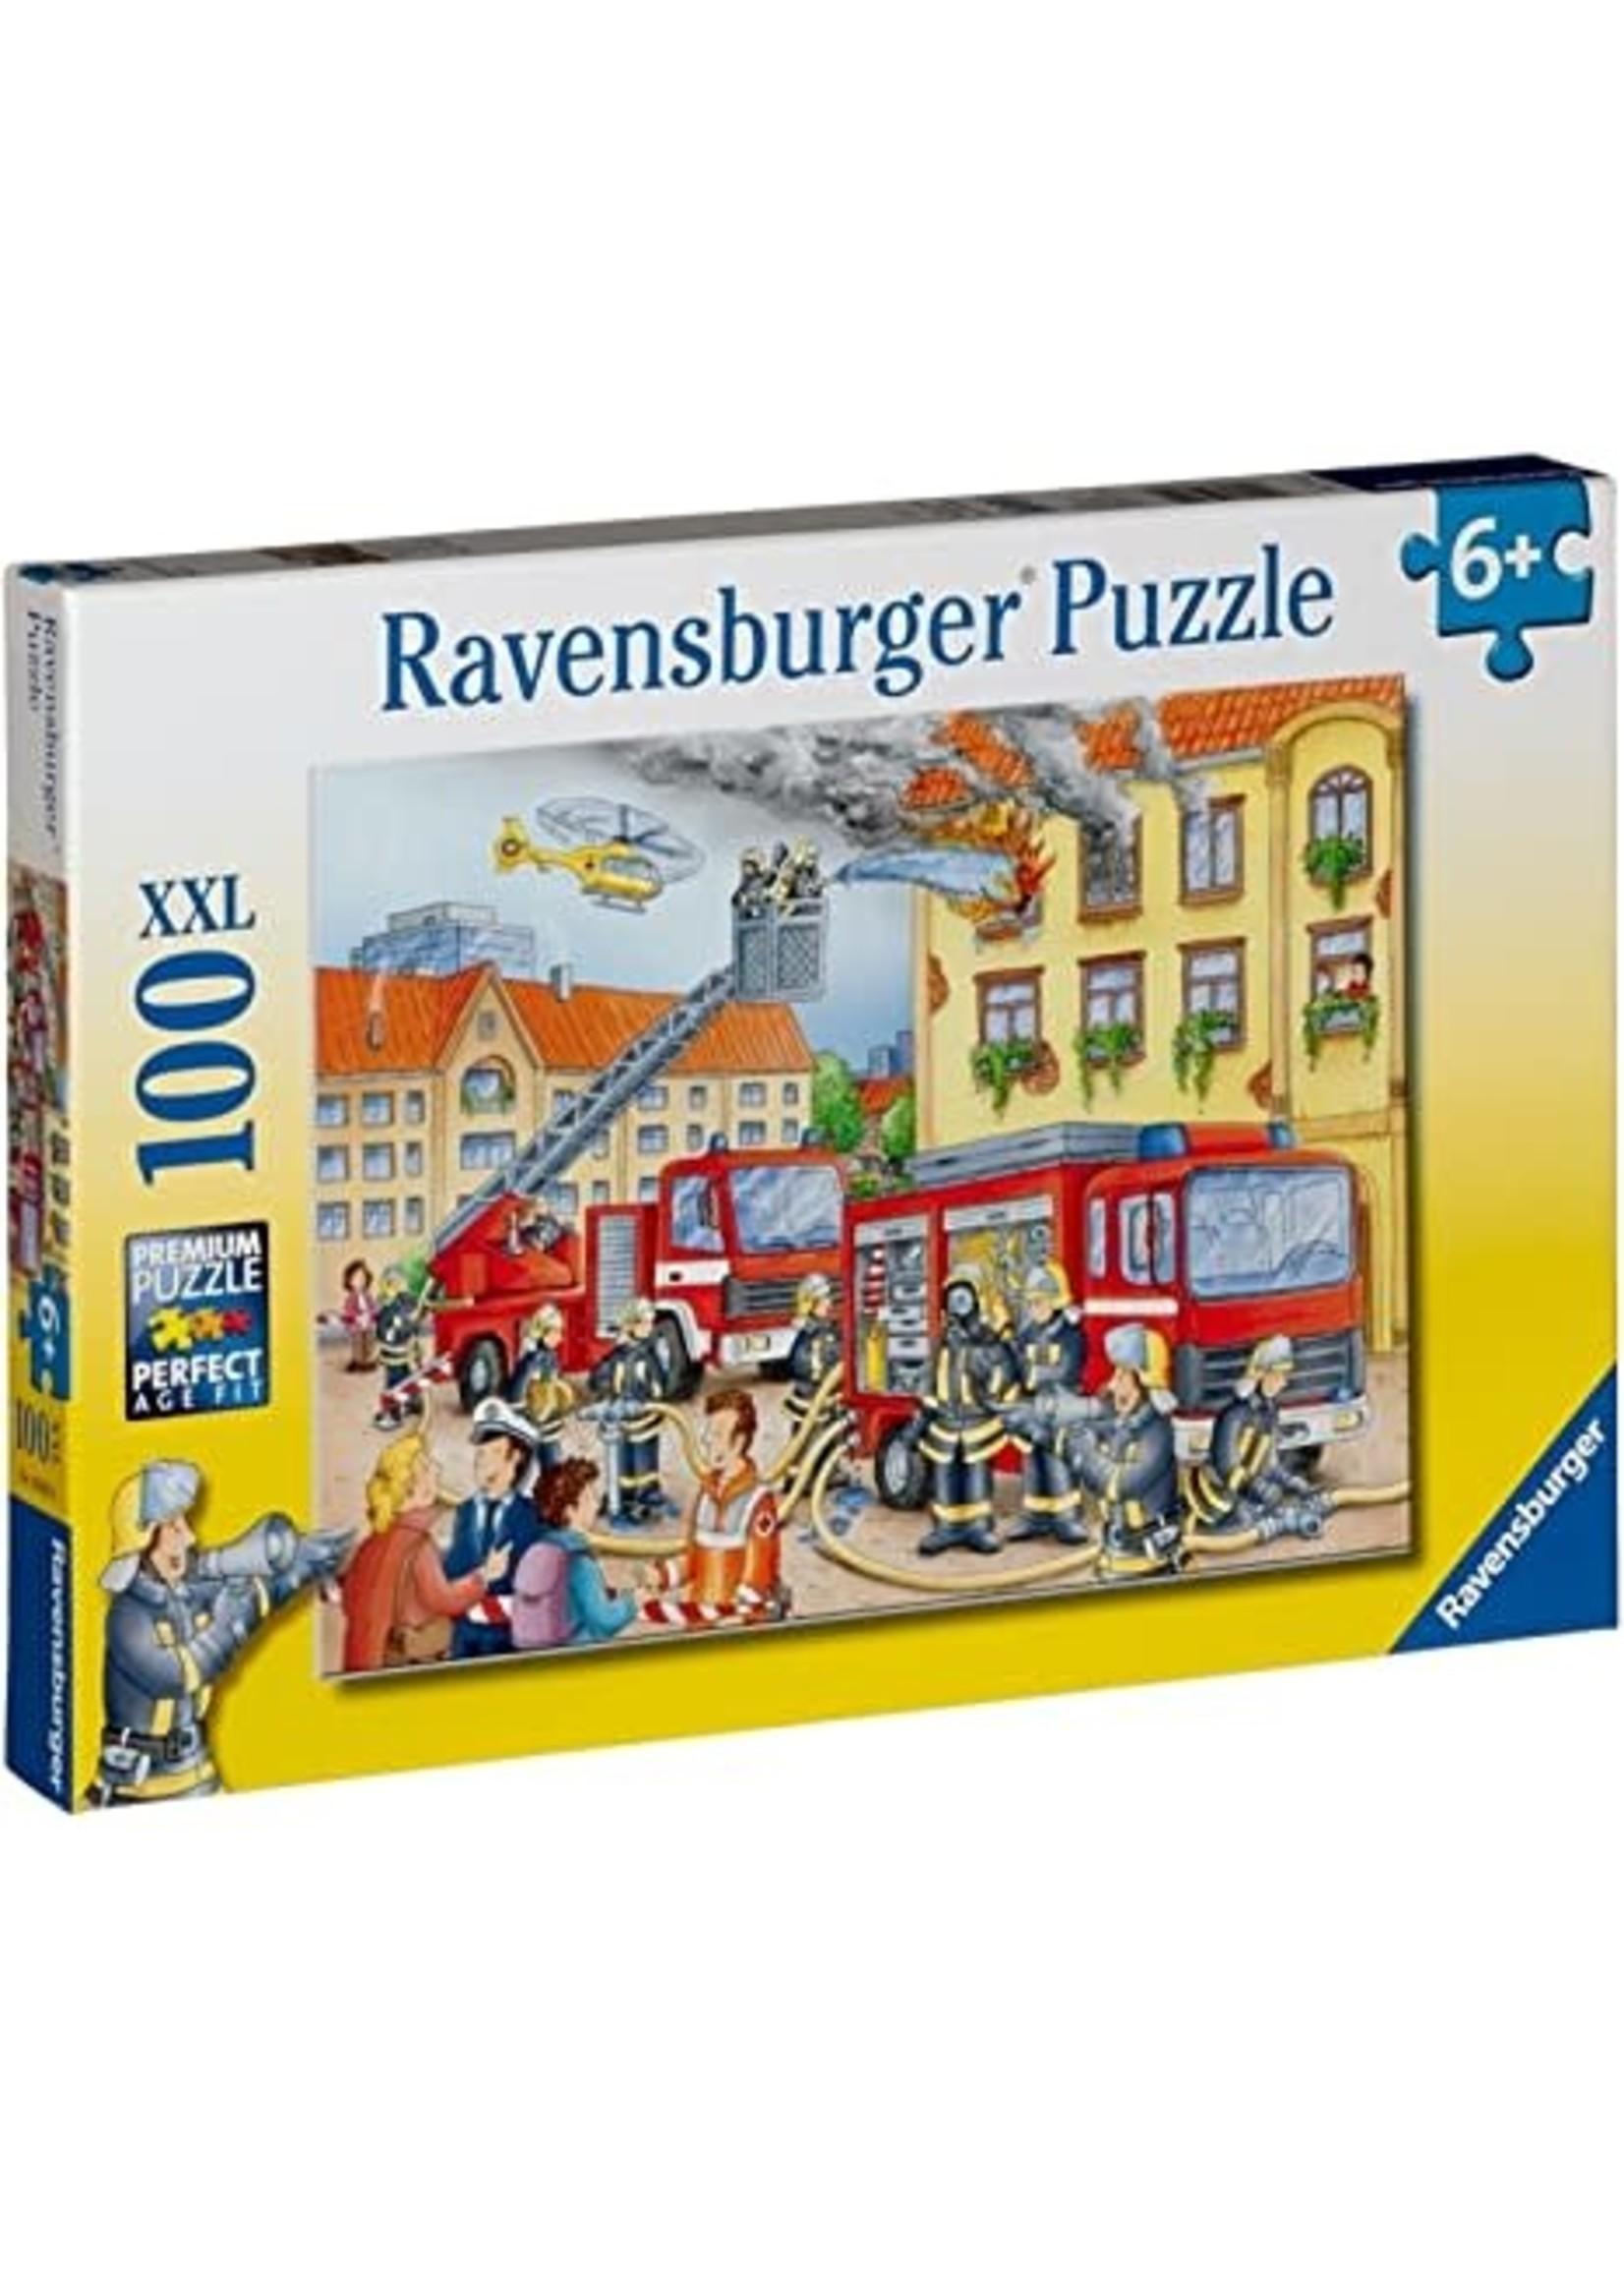 Ravensburger 100pc XXL Puzzle Firehouse Frenzy